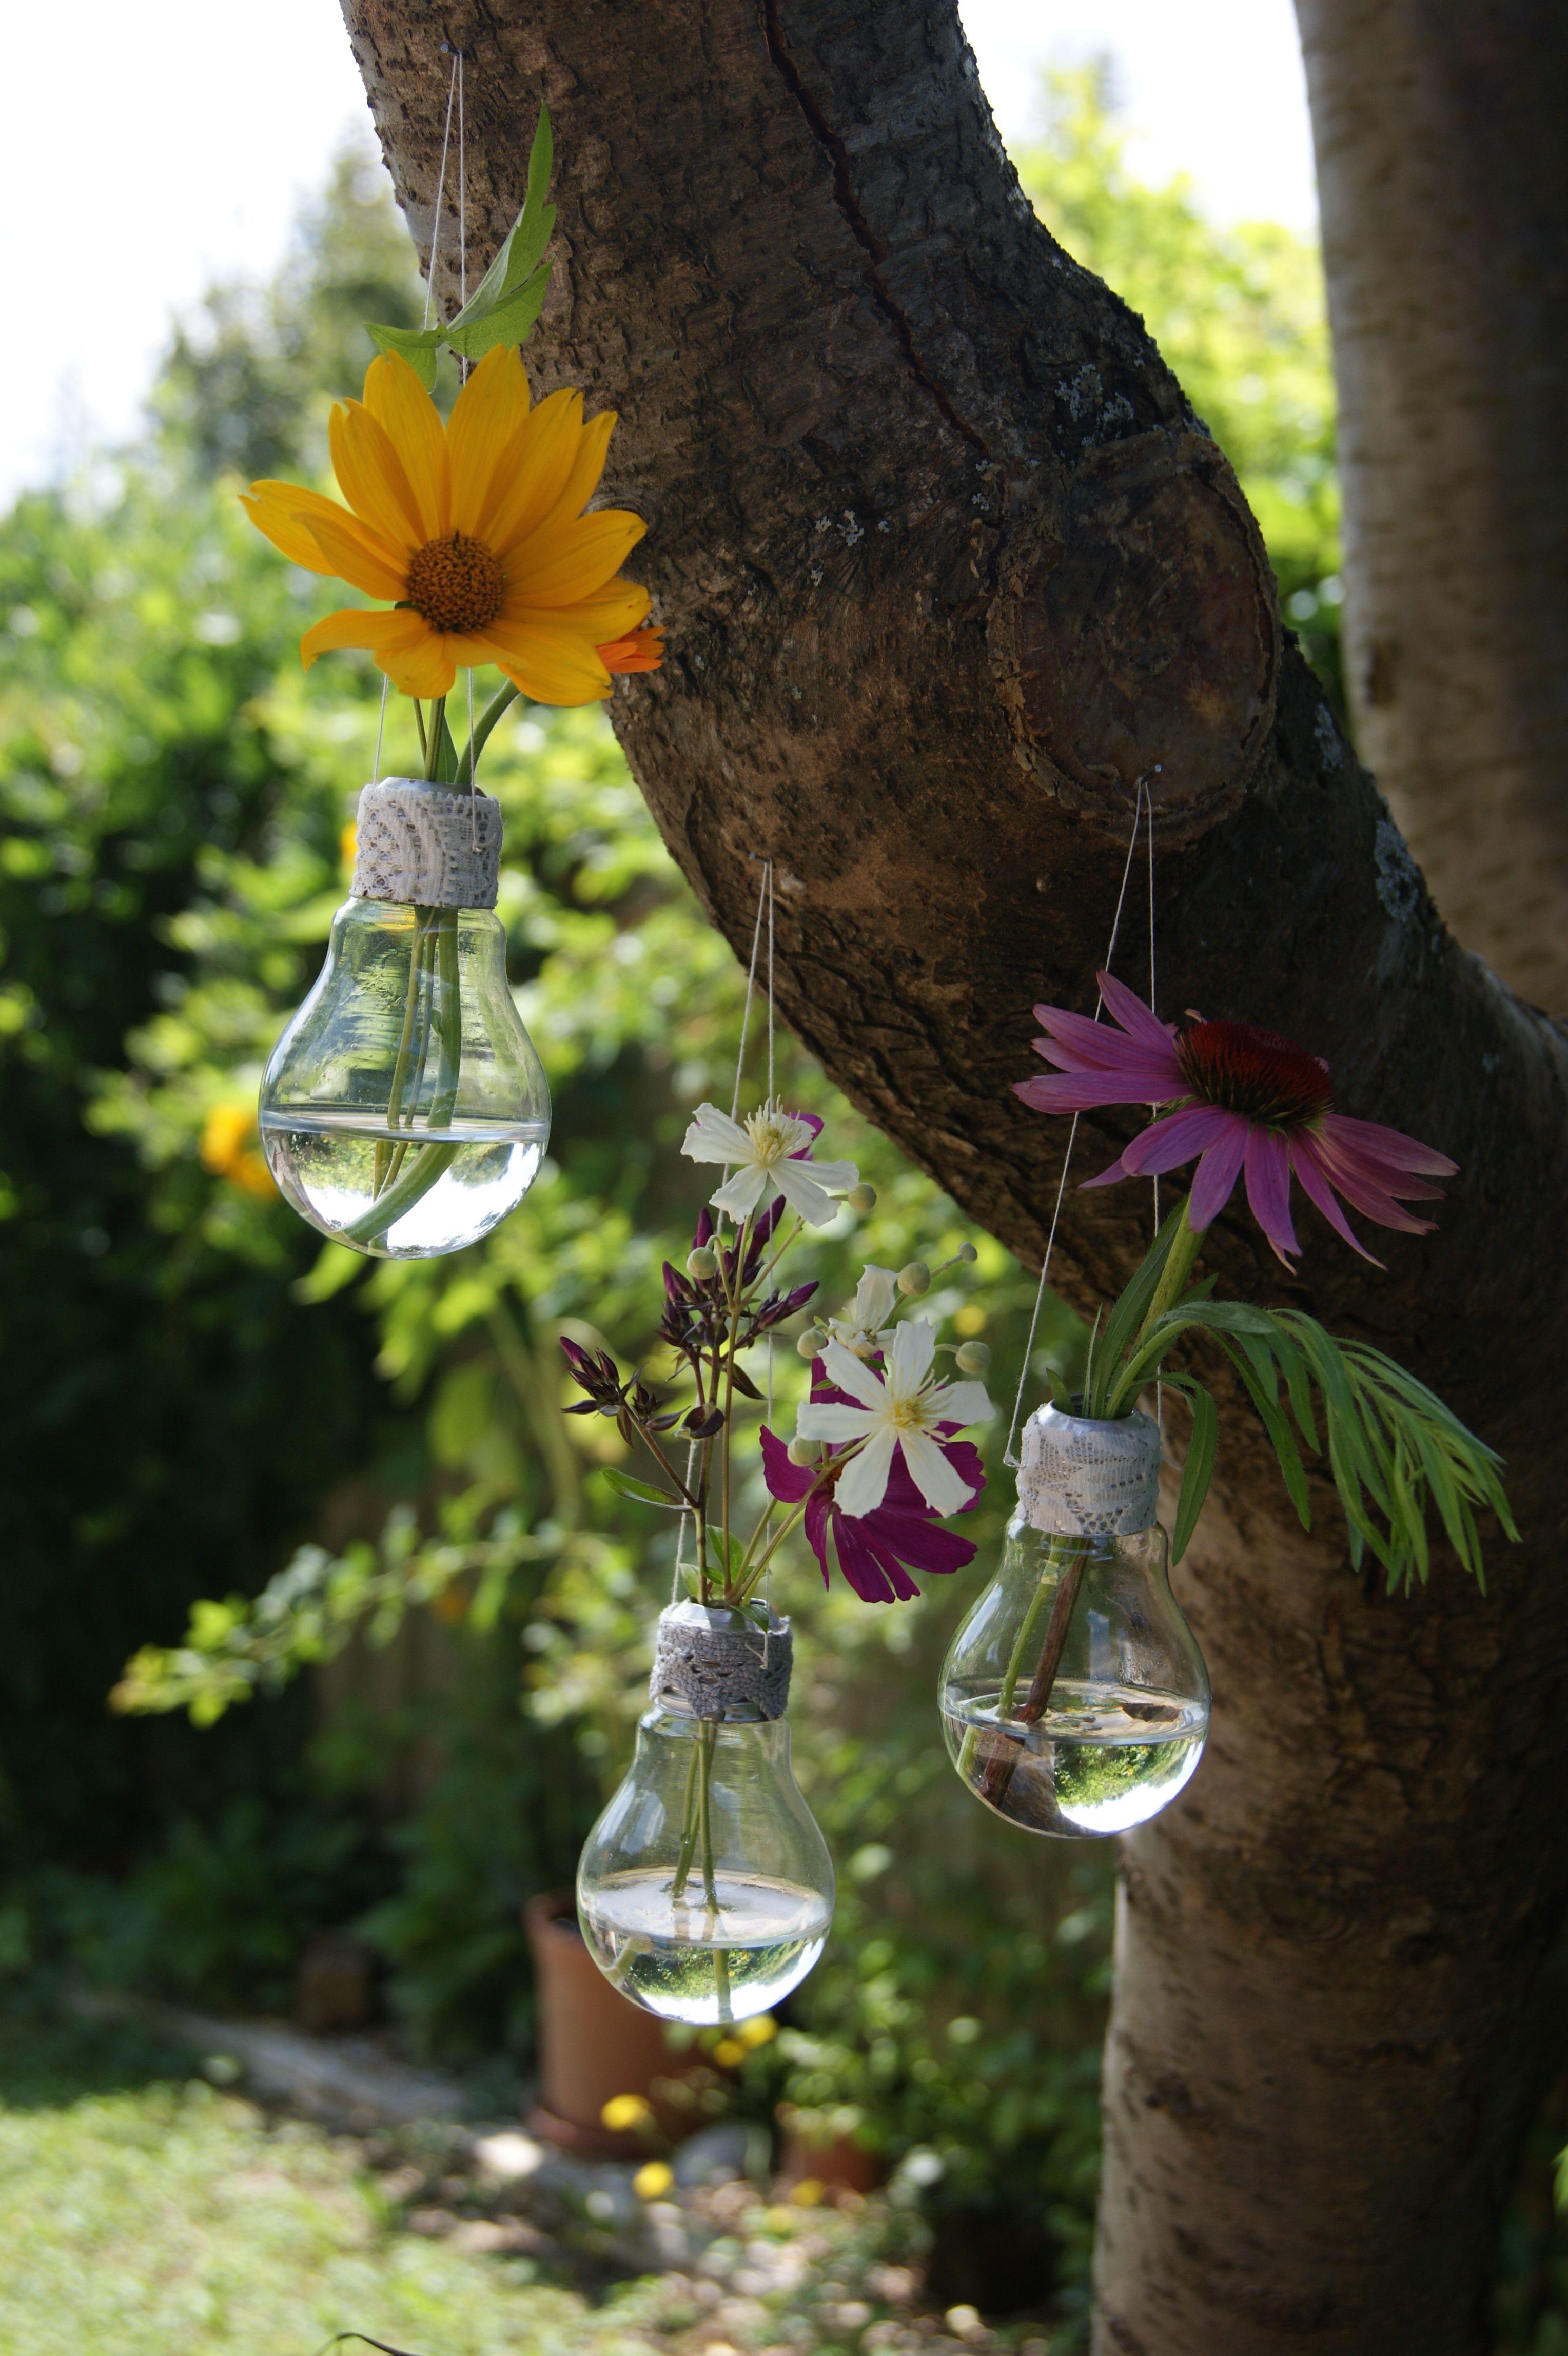 bulbs and flowers